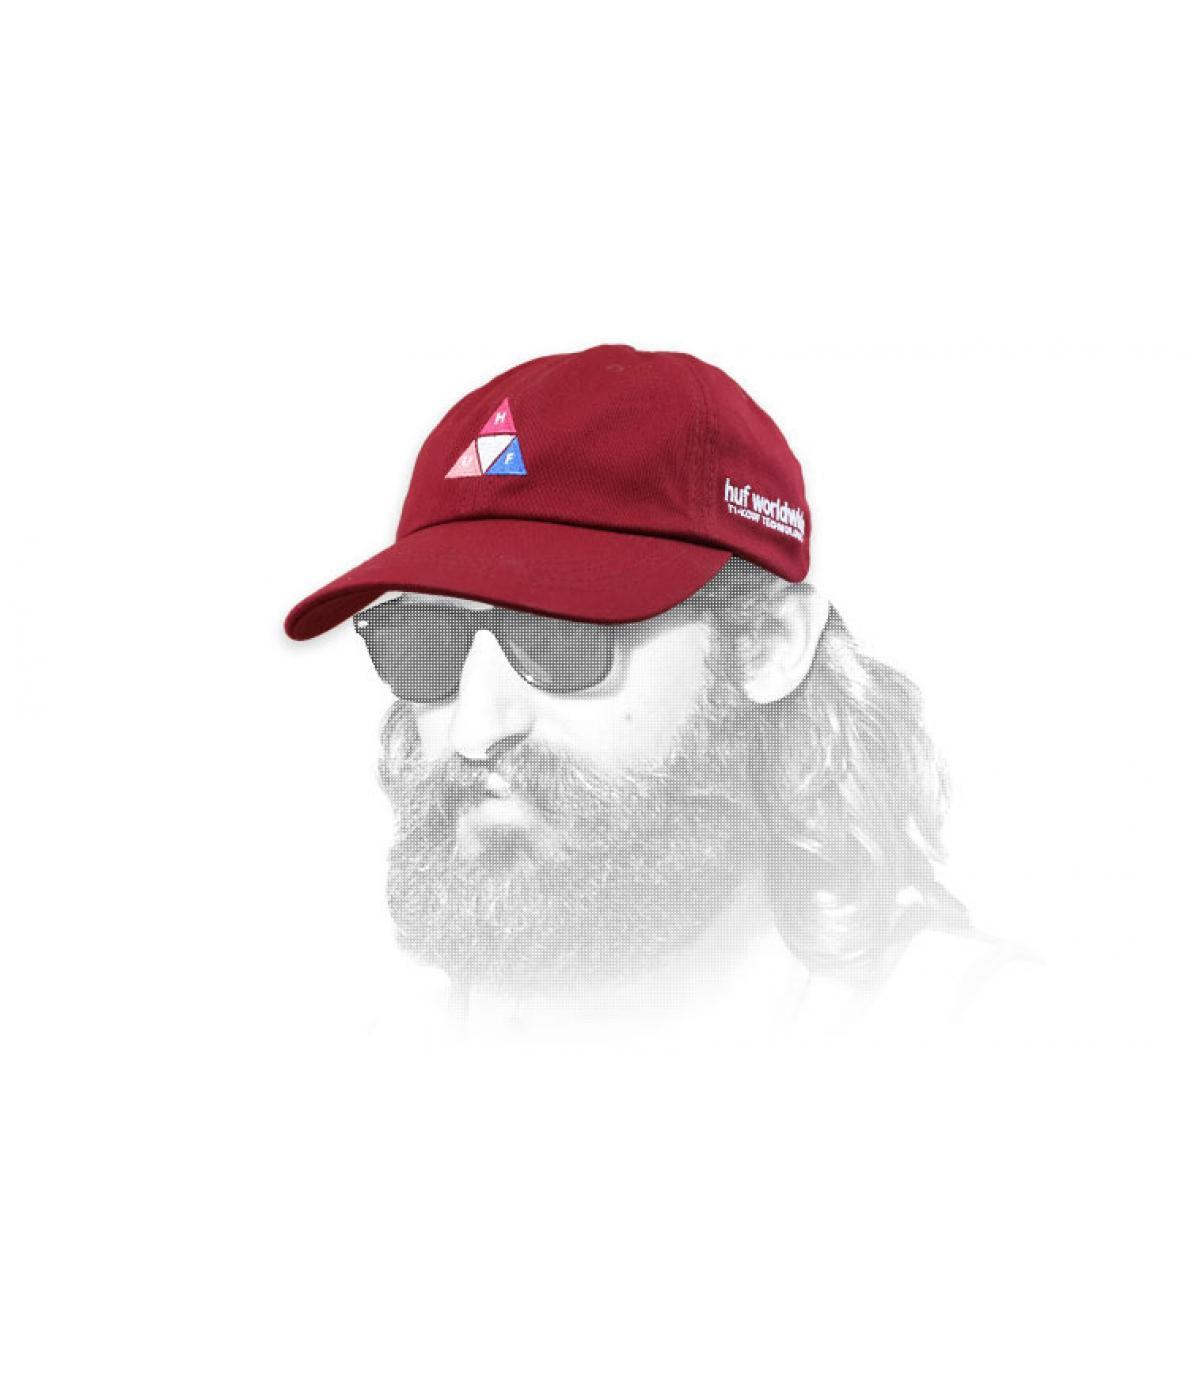 Huf Cap Dreieck Logo bordeaux